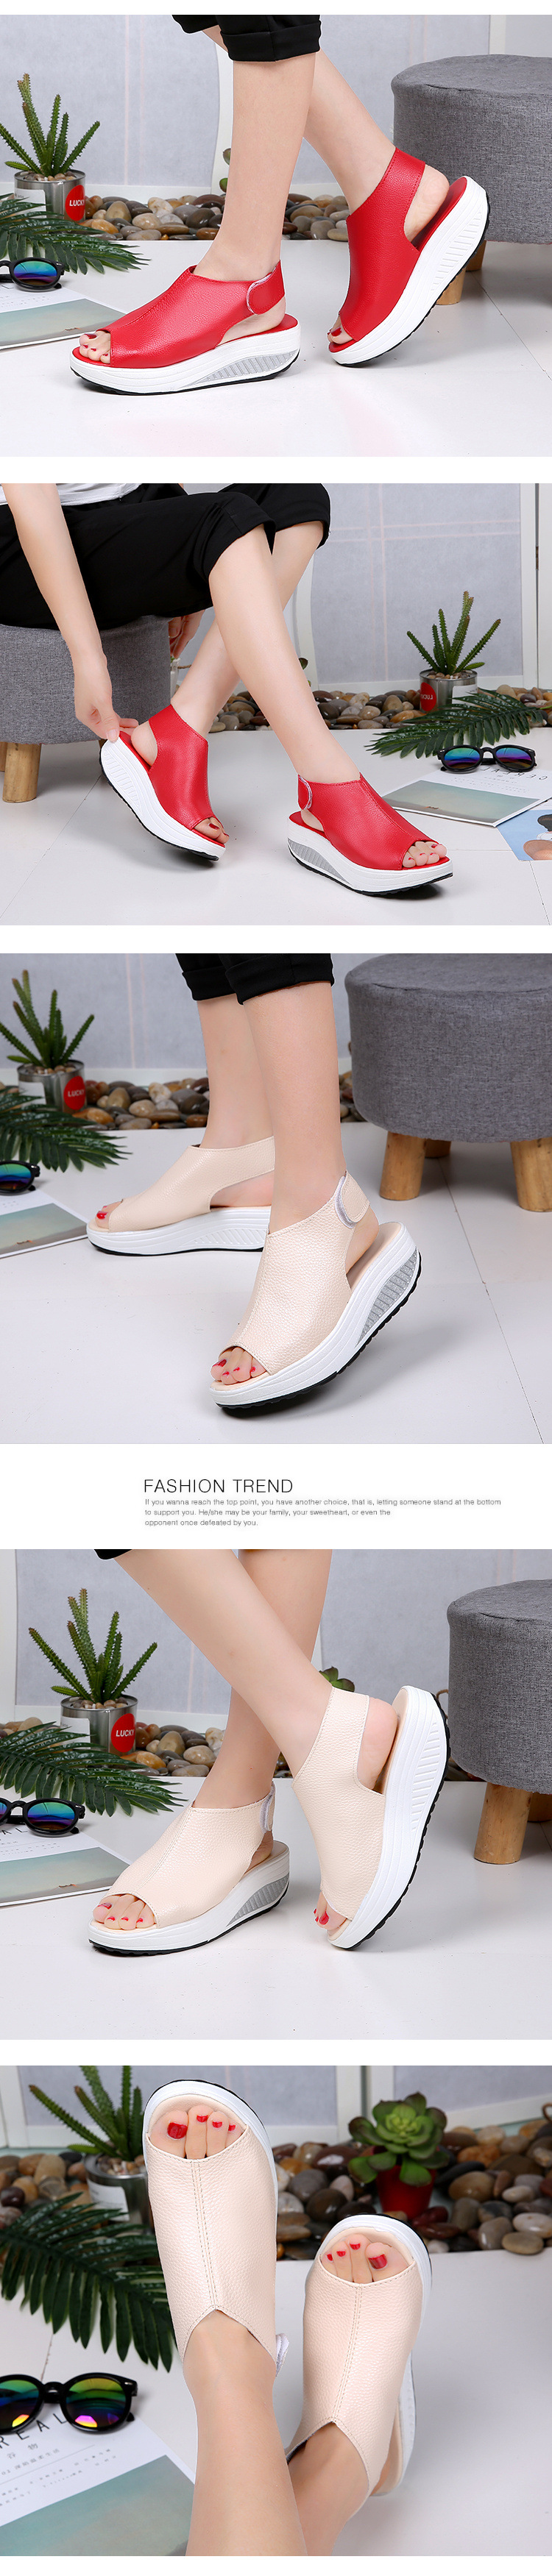 2019 Fashion Women Summer Female Sandals Vintage Wedges Platform Shoes Peep Toe Sandal High Heels Fish Toe Shoes Zapatos Mujer99